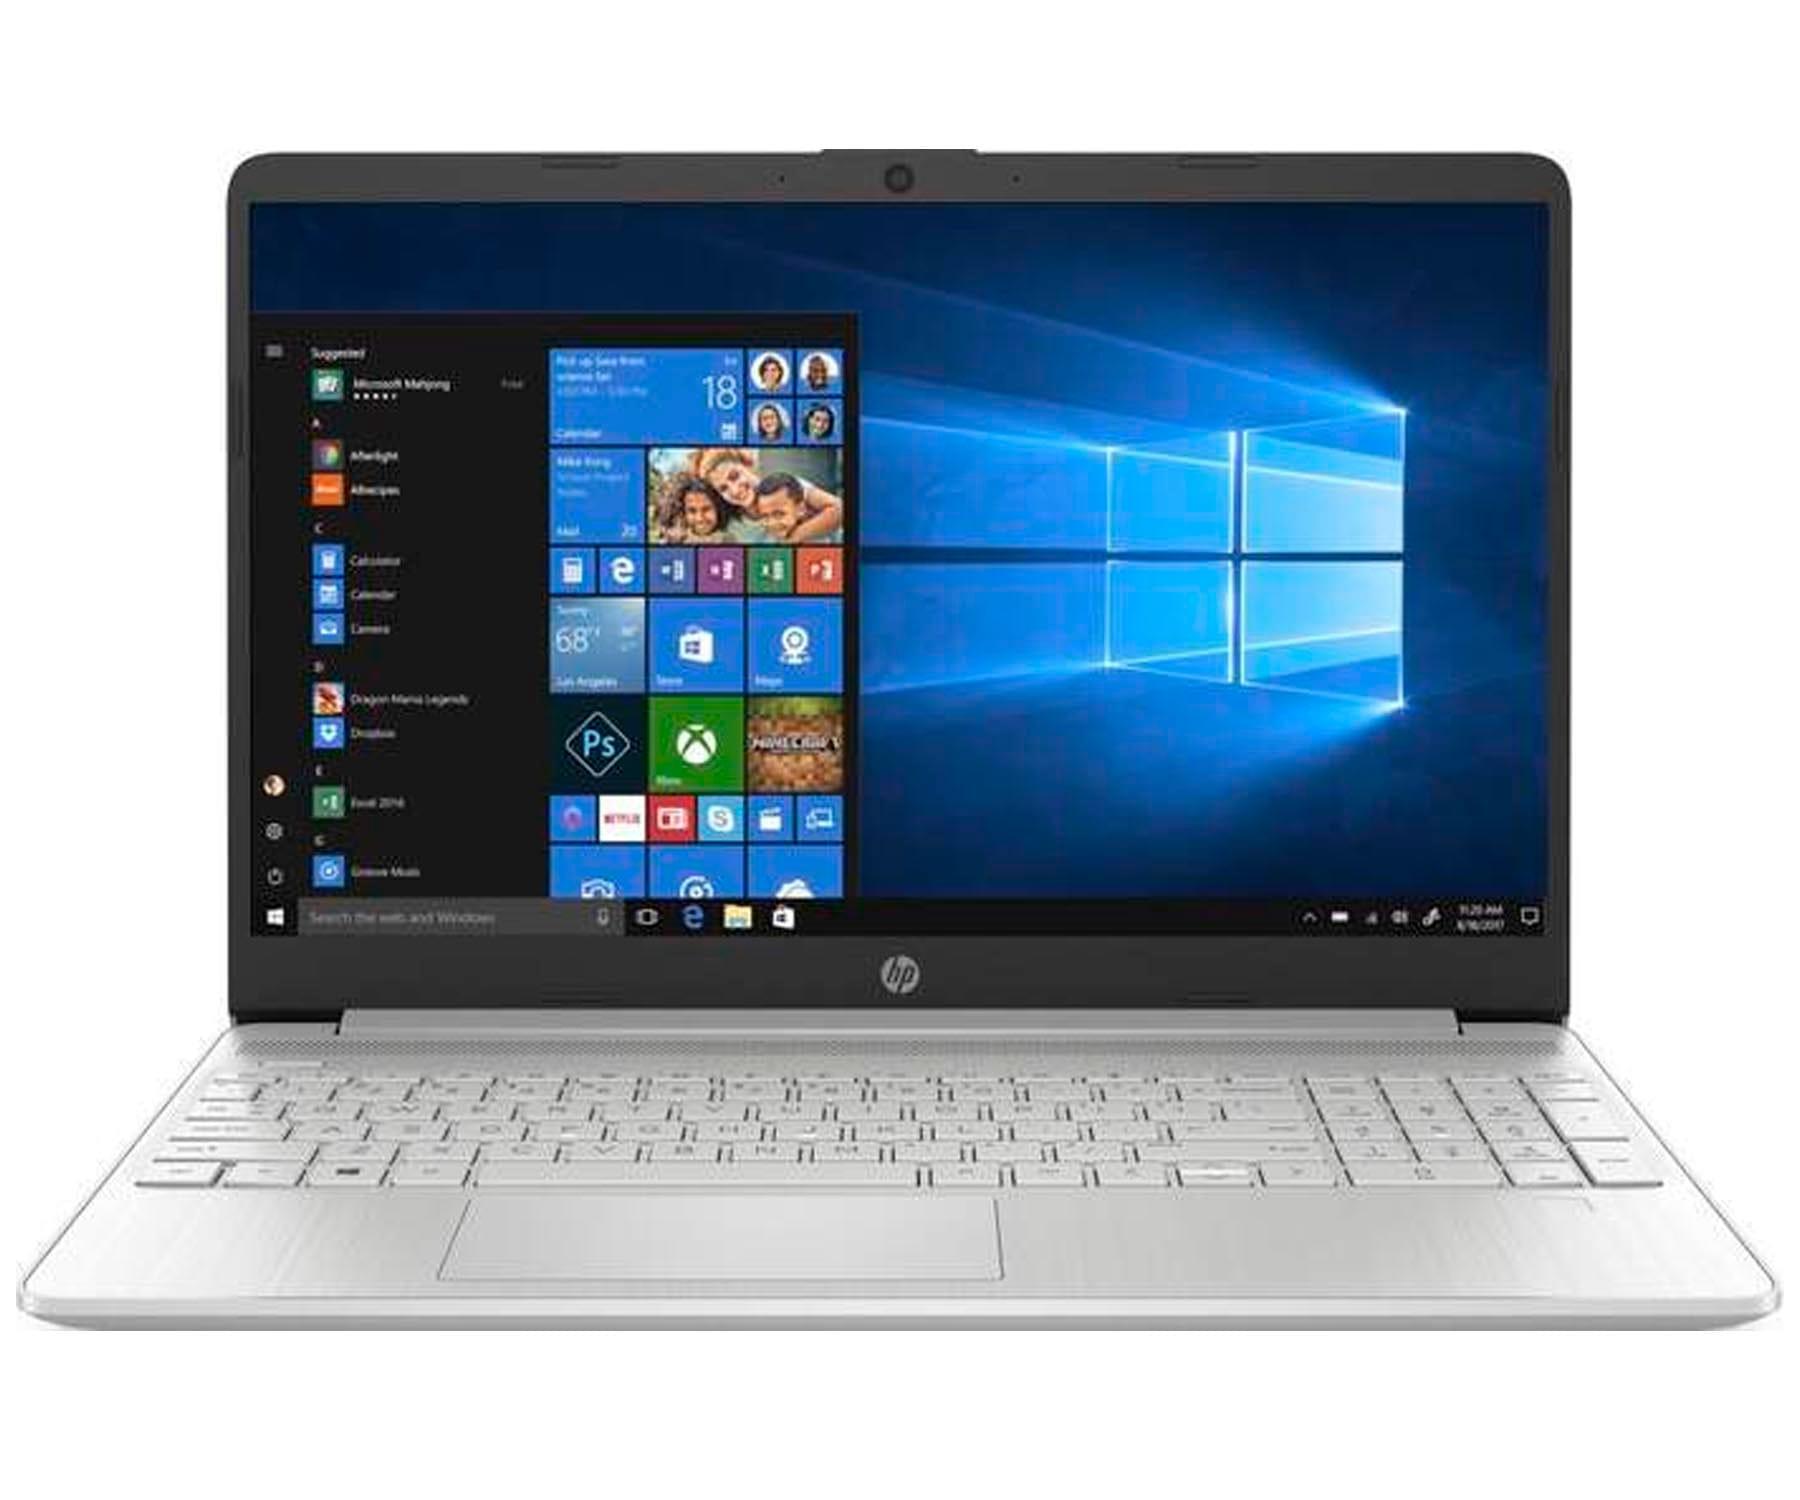 HP LAPTOP 15s-FQ1141 PLATA PORTÁTIL 15.6'' HD INTEL i3-1005G1 512GB SSD 8GB RAM WINDOWS 10 HOME